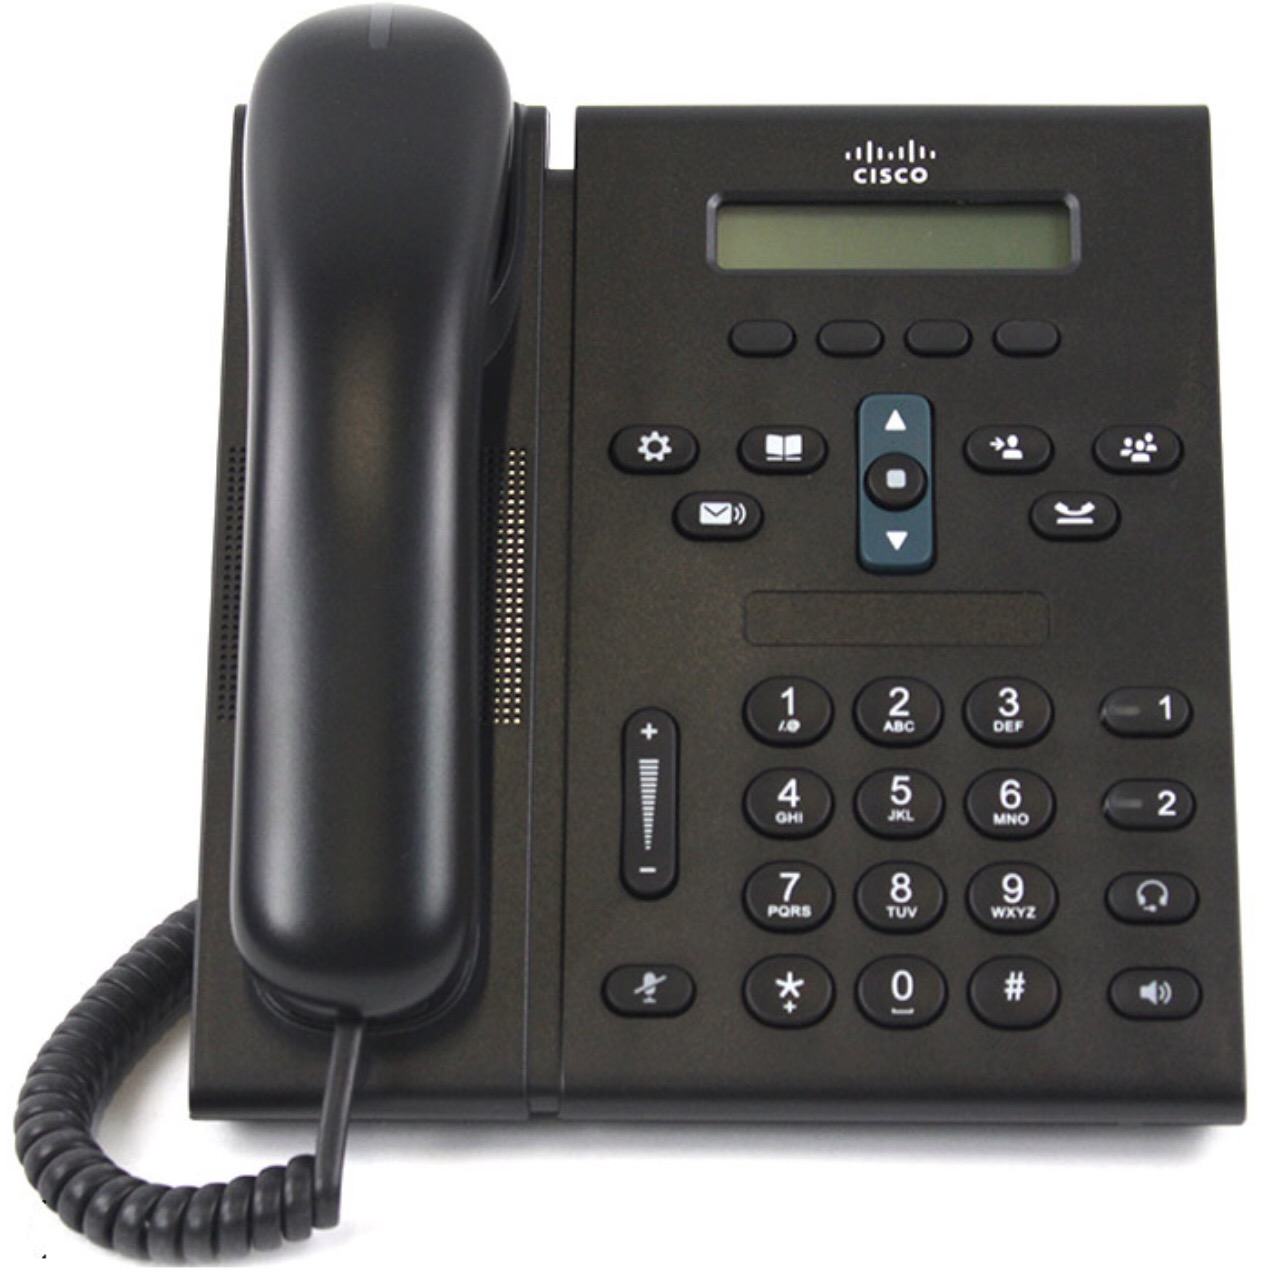 قیمت                      تلفن تحت شبکه سیسکو مدل 6921